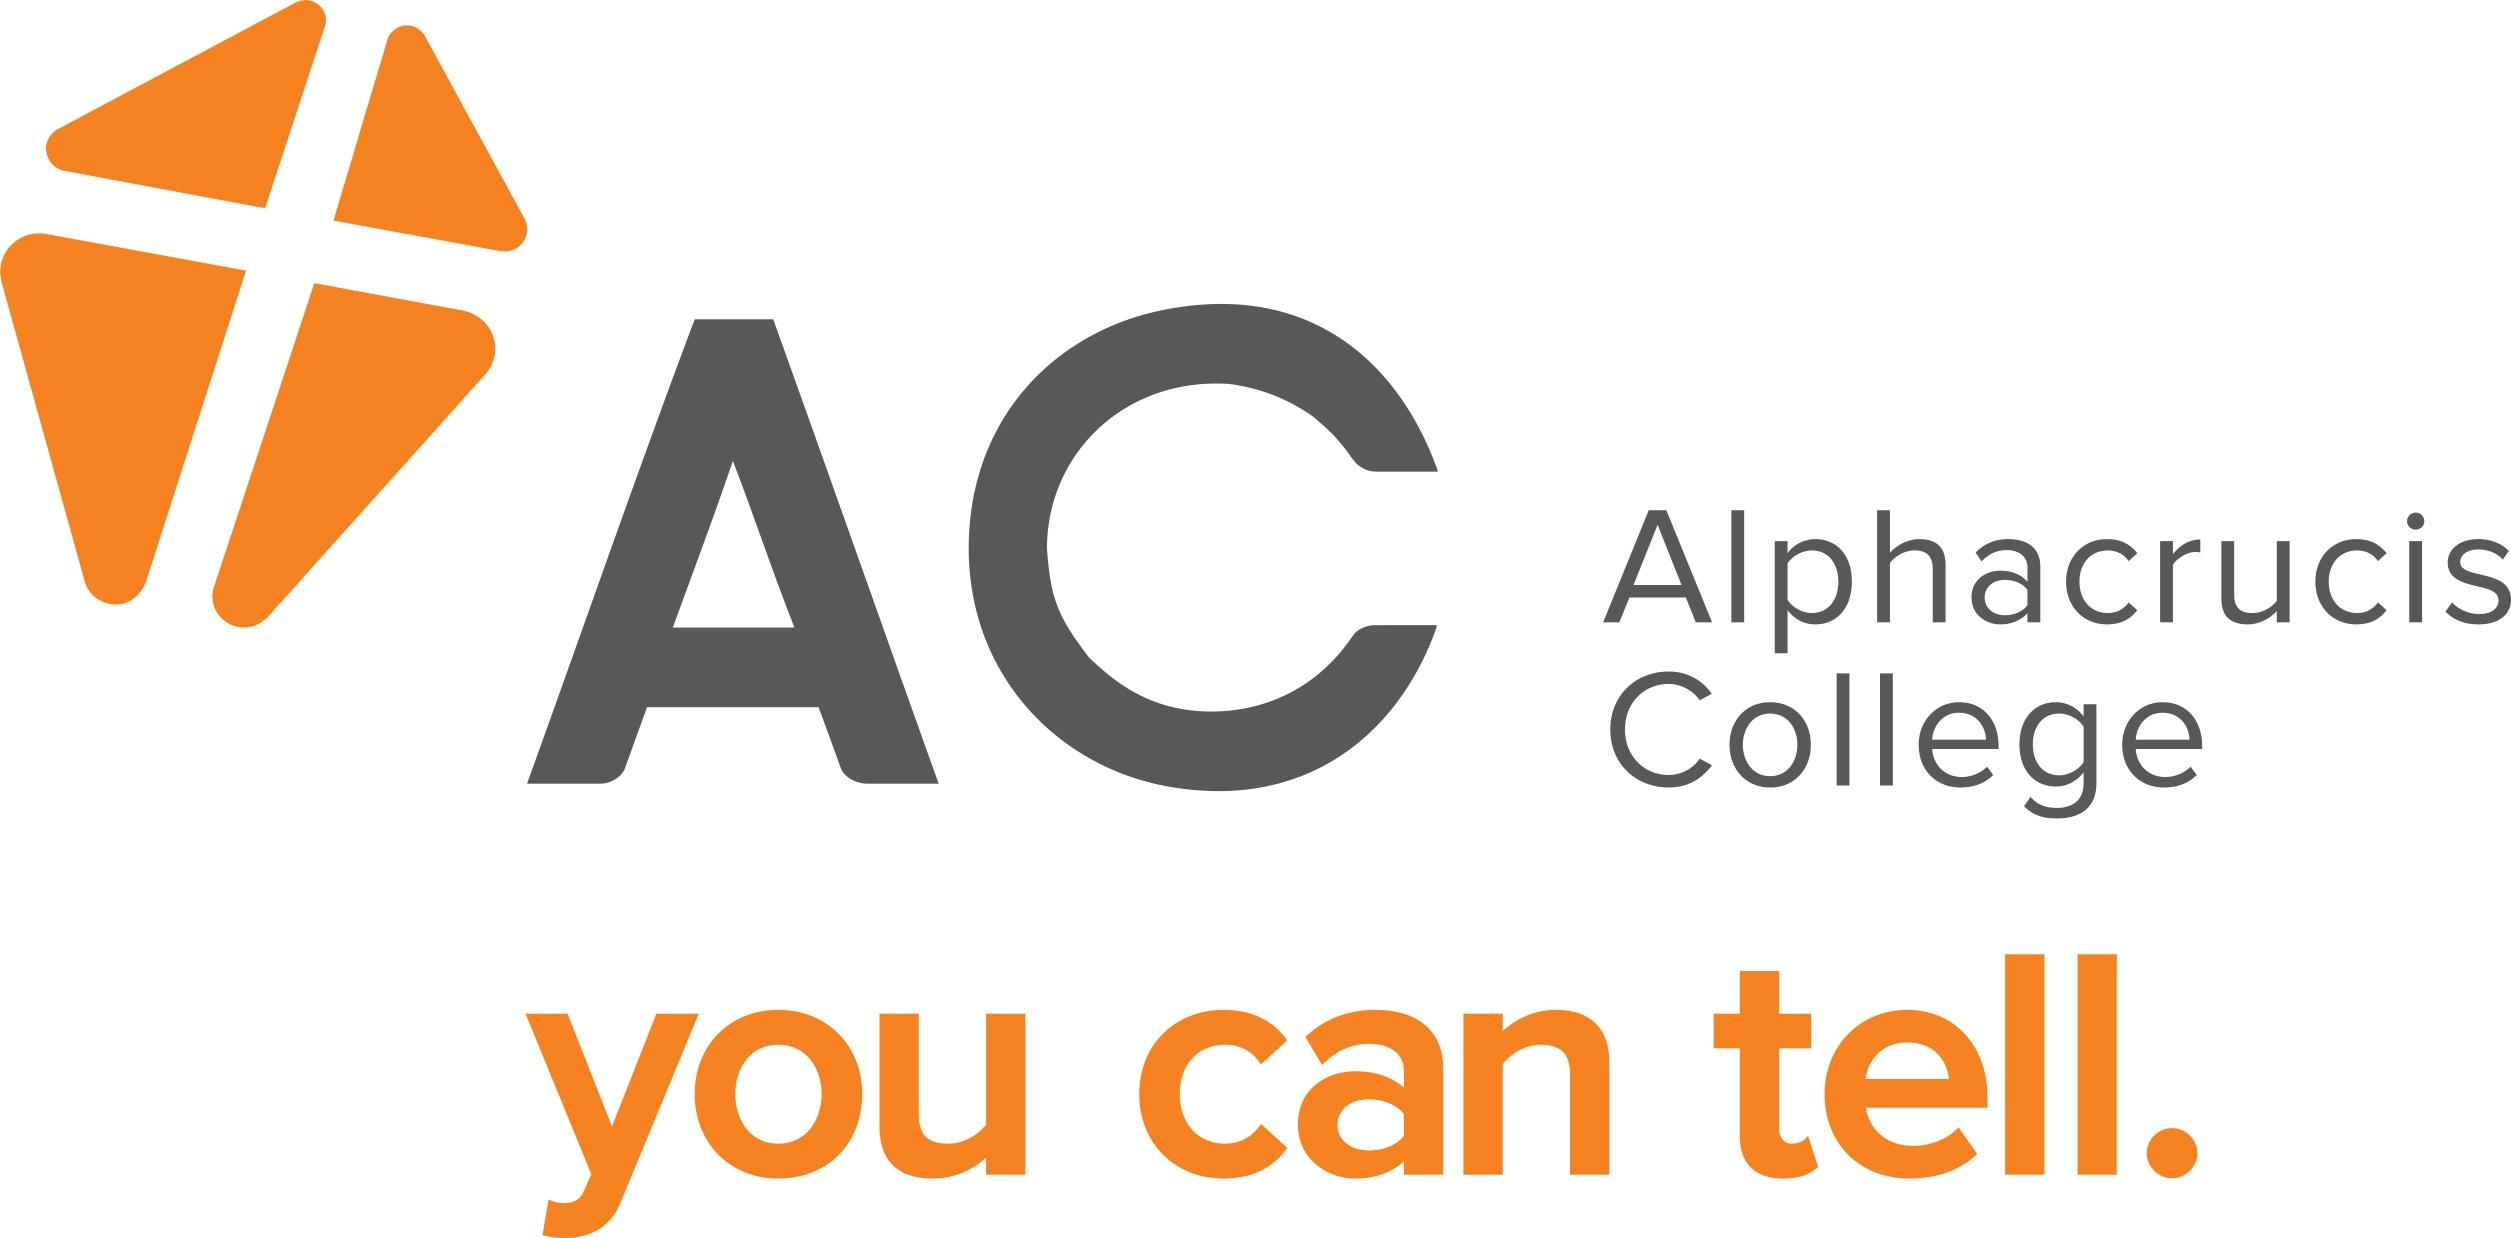 Alphacrucis_College_logo